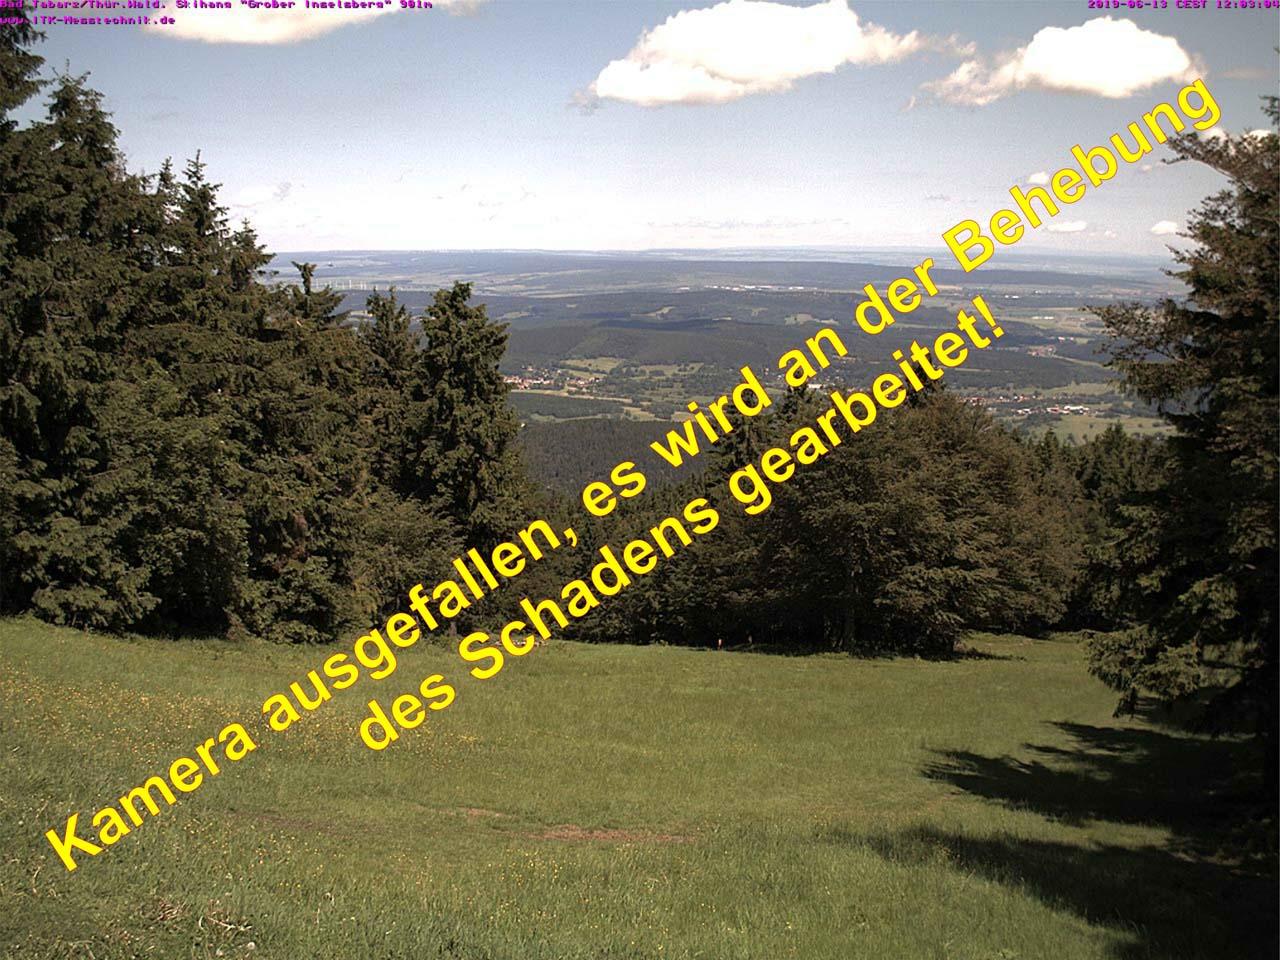 http://www.itk-infrarot.de/inselsberg/cam1m.jpg?echtzeit=1191156686